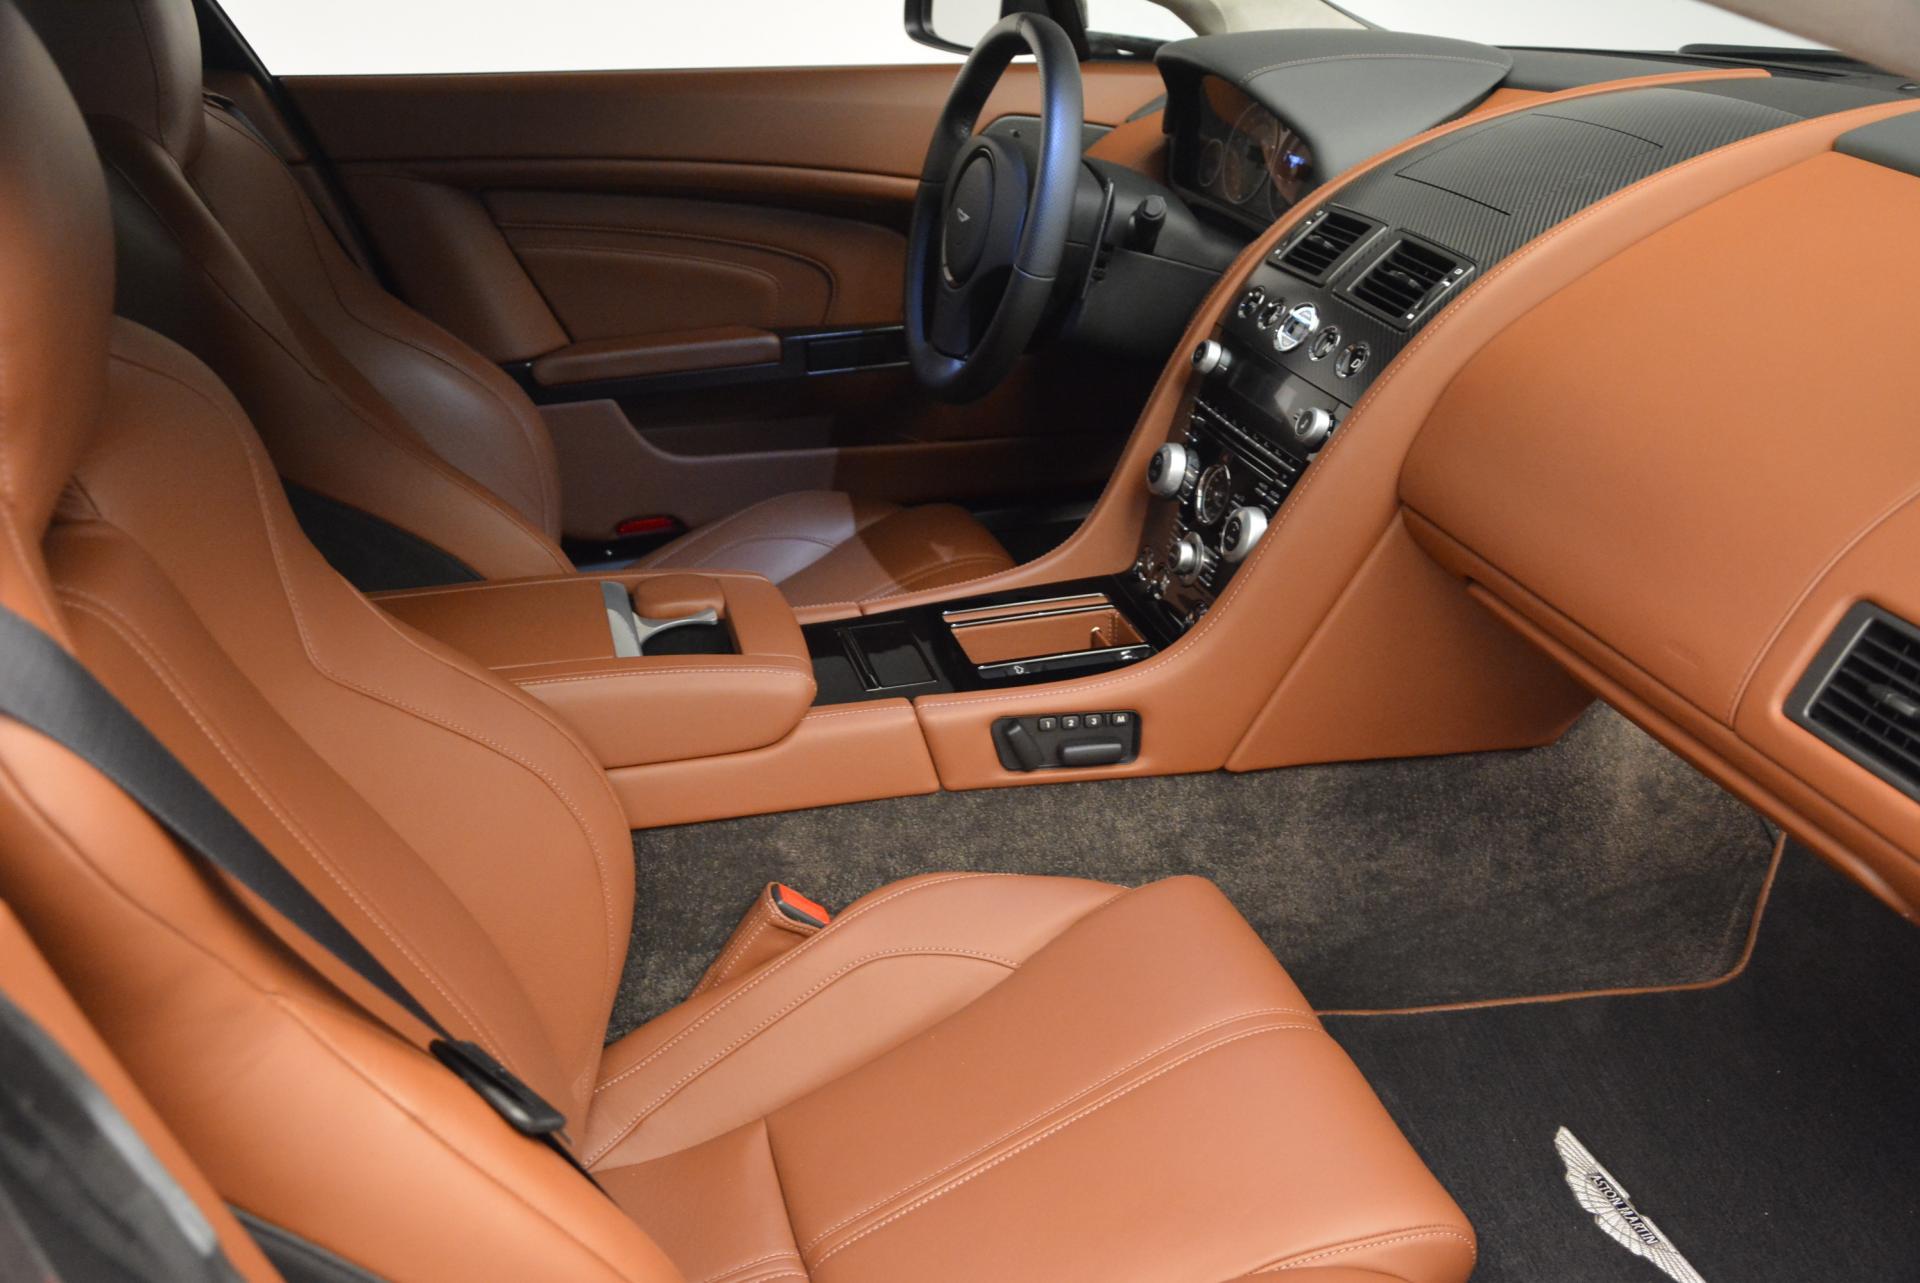 Used 2015 Aston Martin V12 Vantage S  For Sale In Greenwich, CT. Alfa Romeo of Greenwich, 7003 101_p23